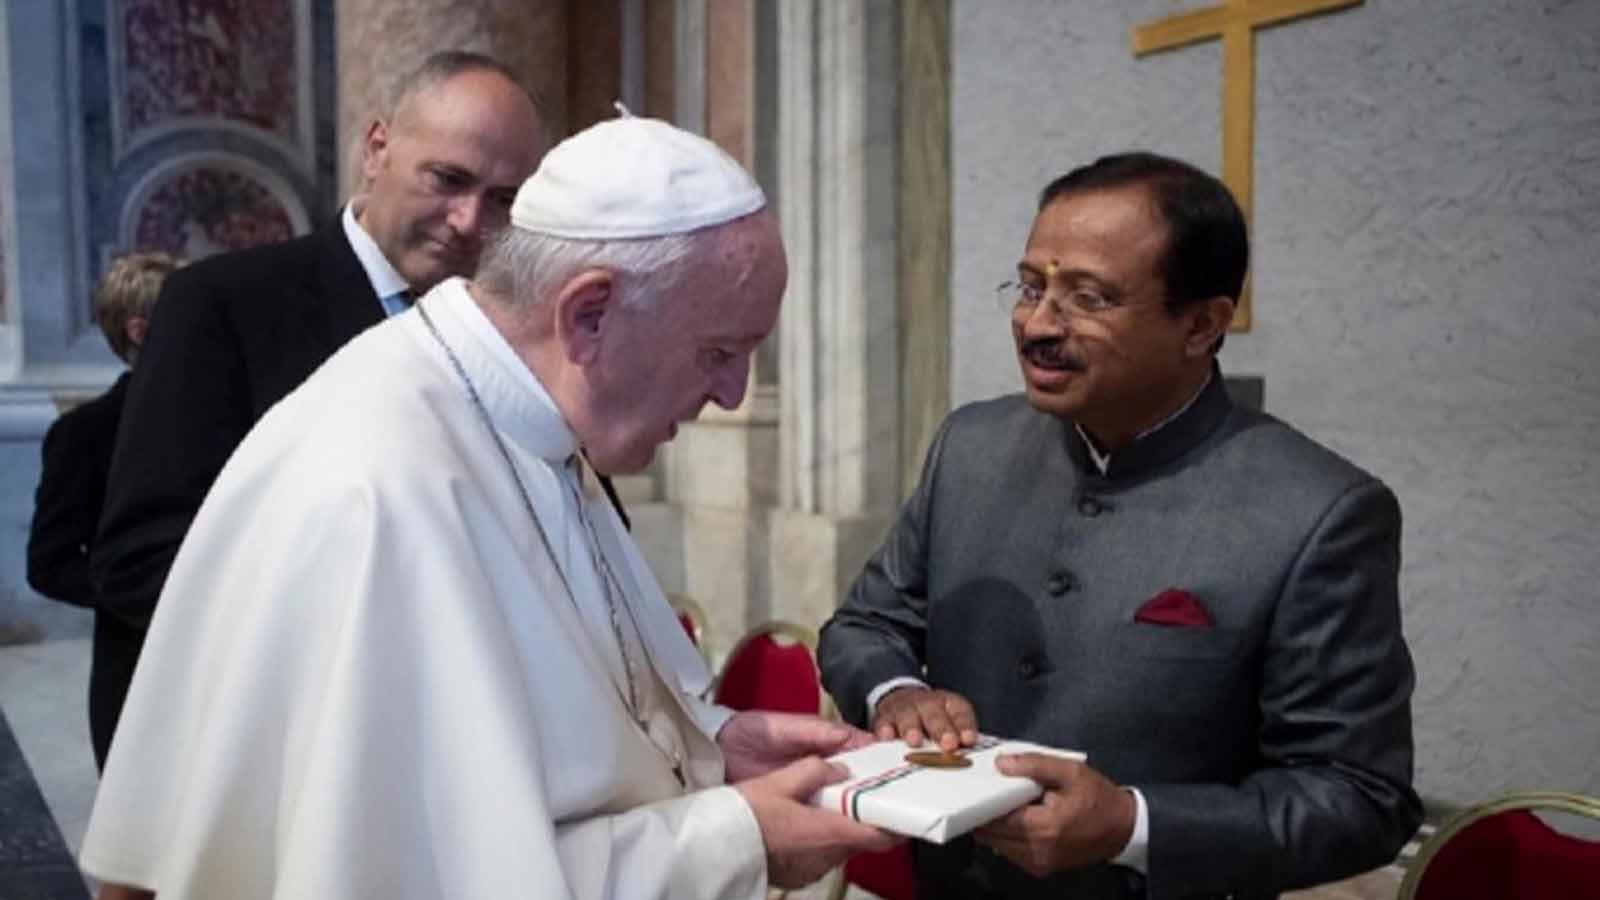 mos-v-muraleedharan-meets-pope-francis-in-vatican-city